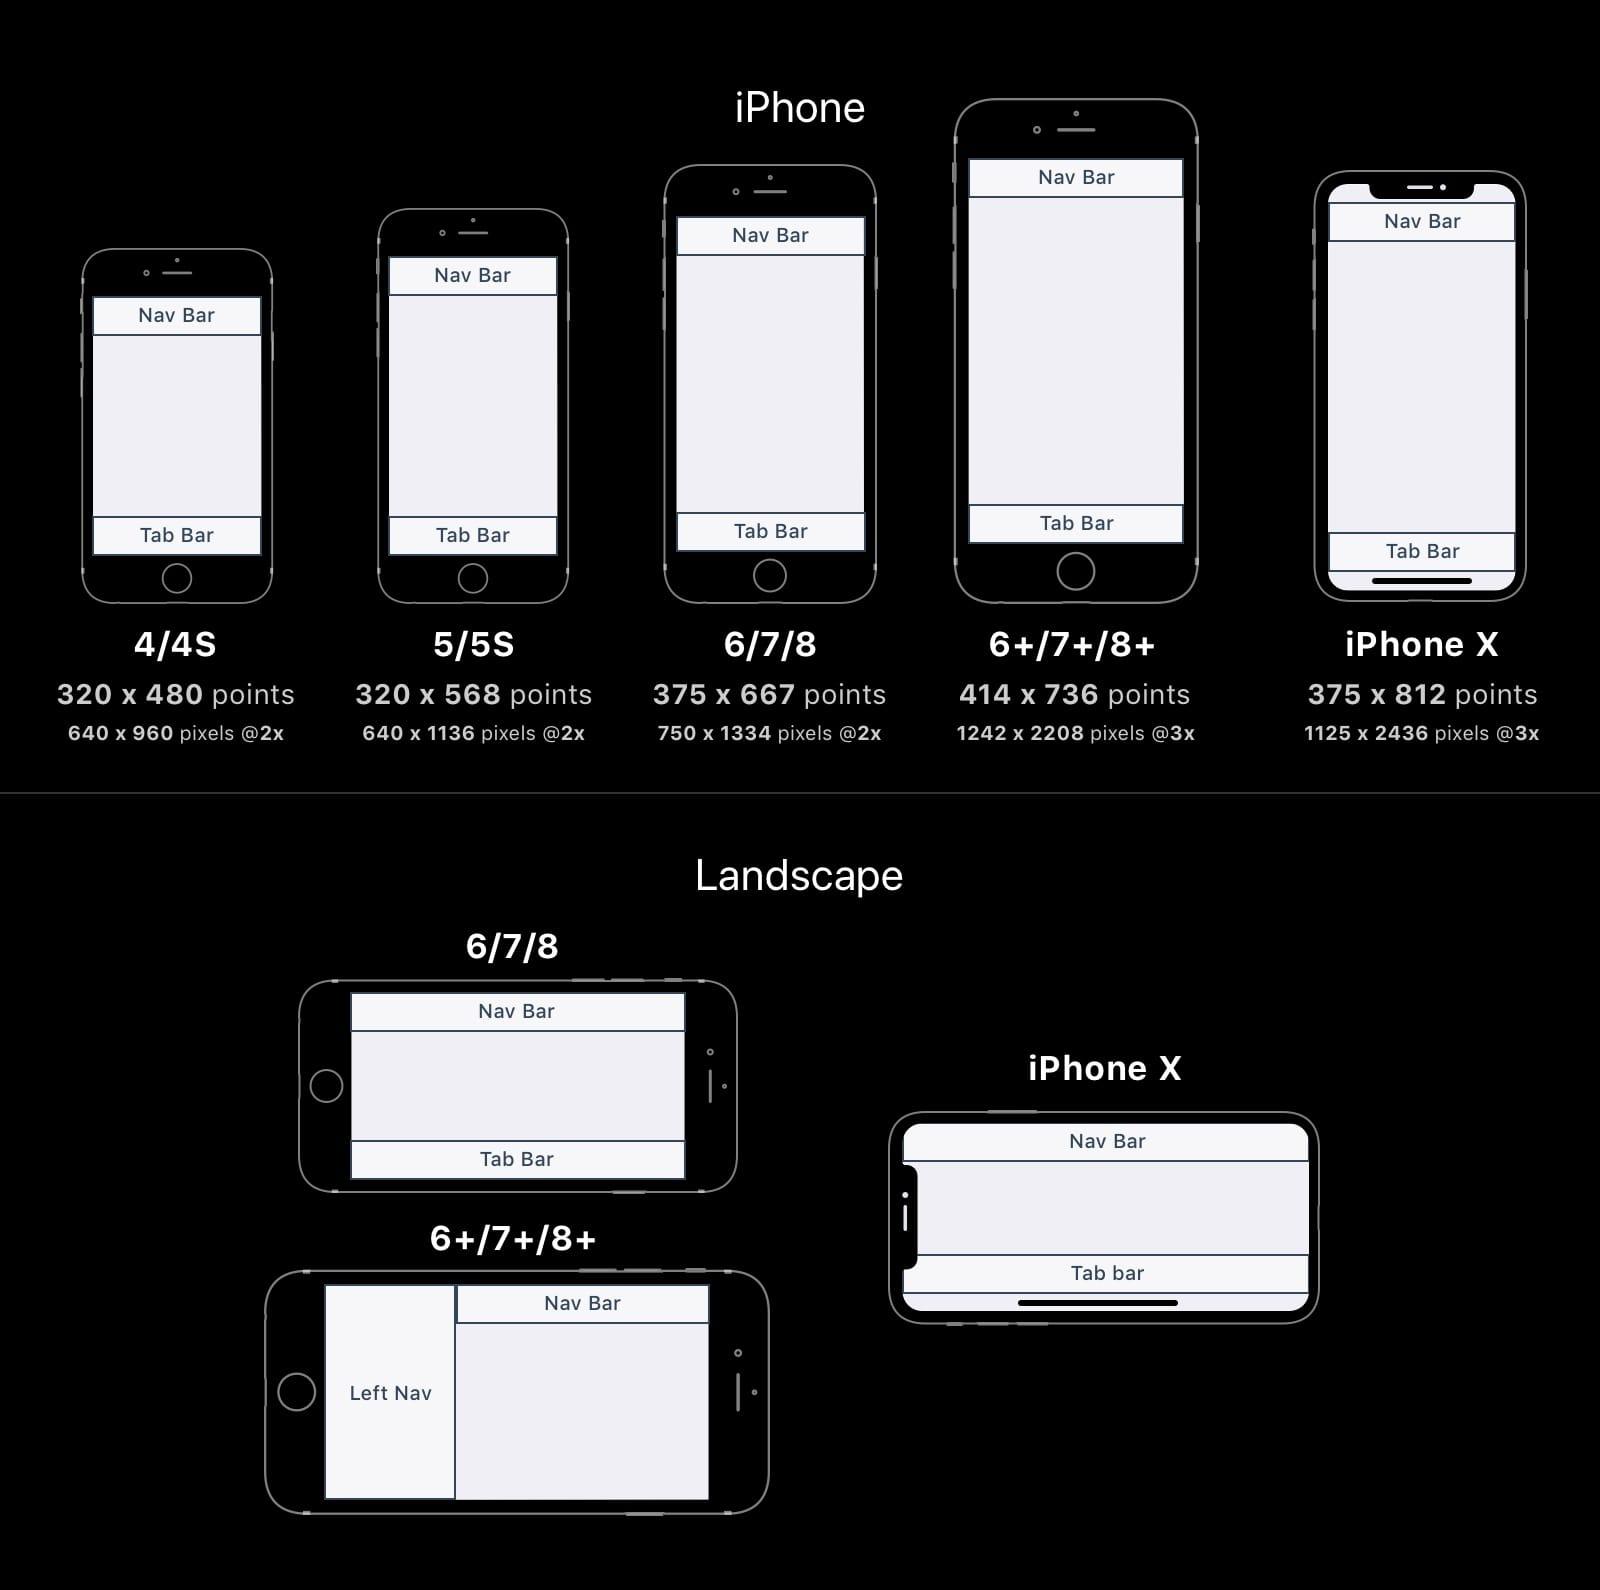 Дизайн под iPhone X. Гайдлайны для iOS 11 - 12